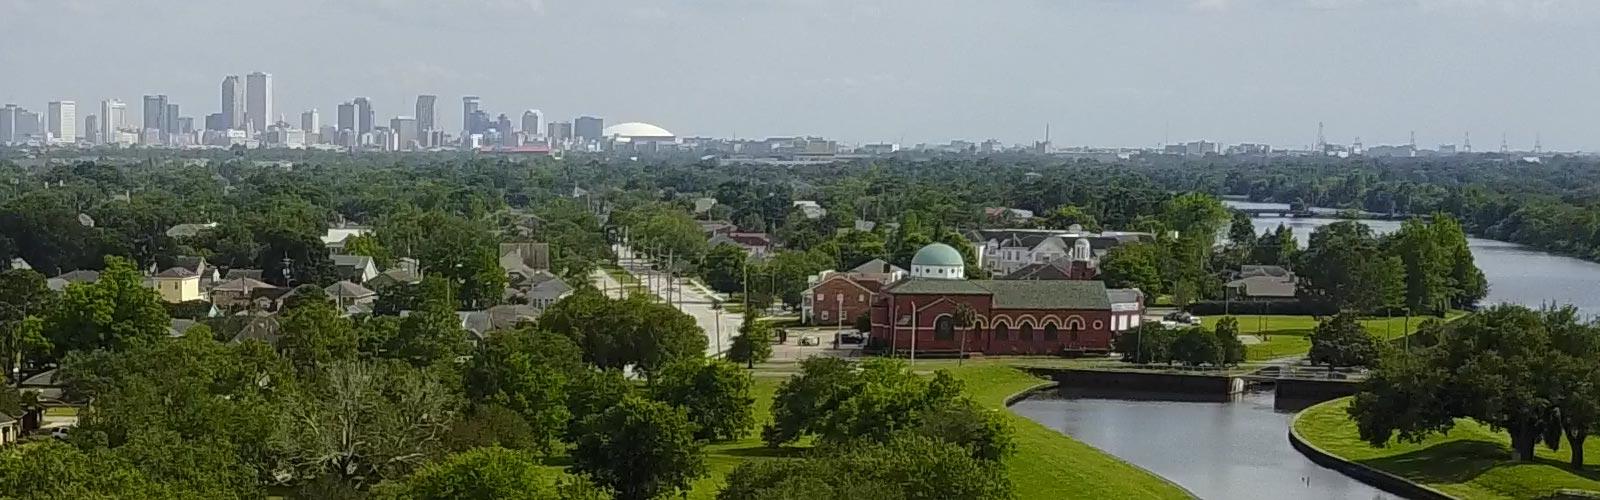 Filmore New Orleans, LA